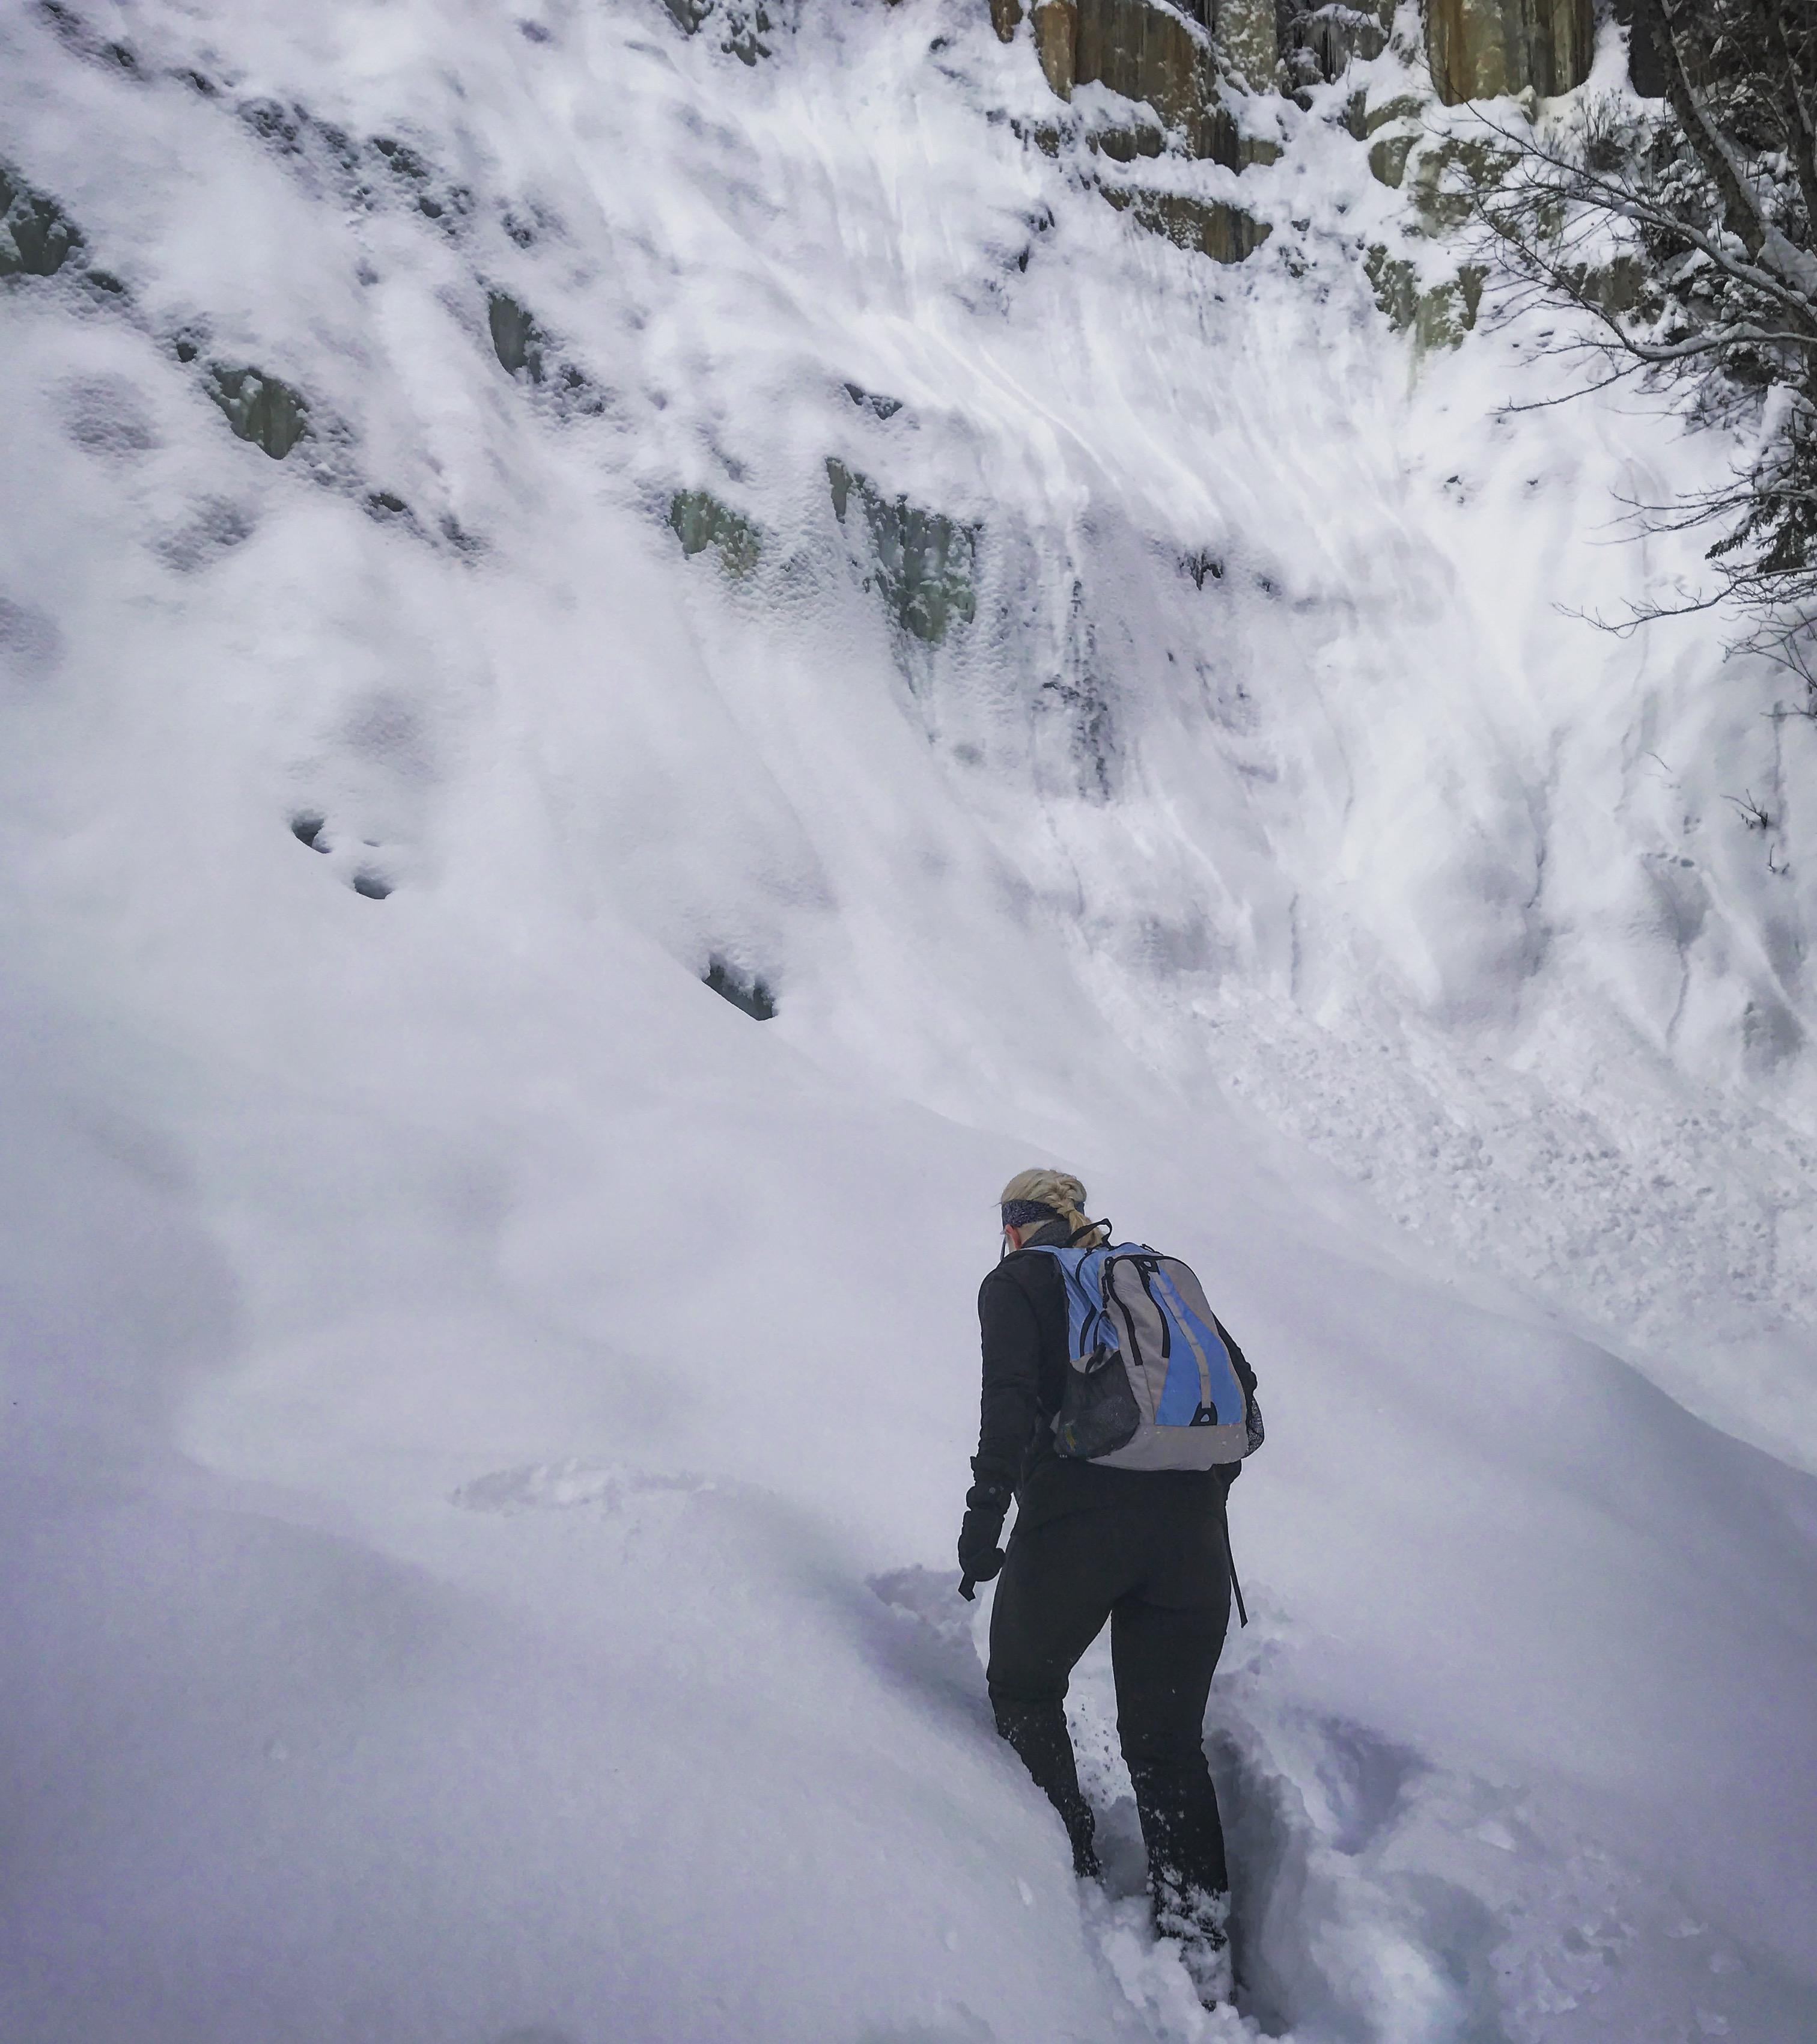 Go Chasin' That (Frozen) Waterfall